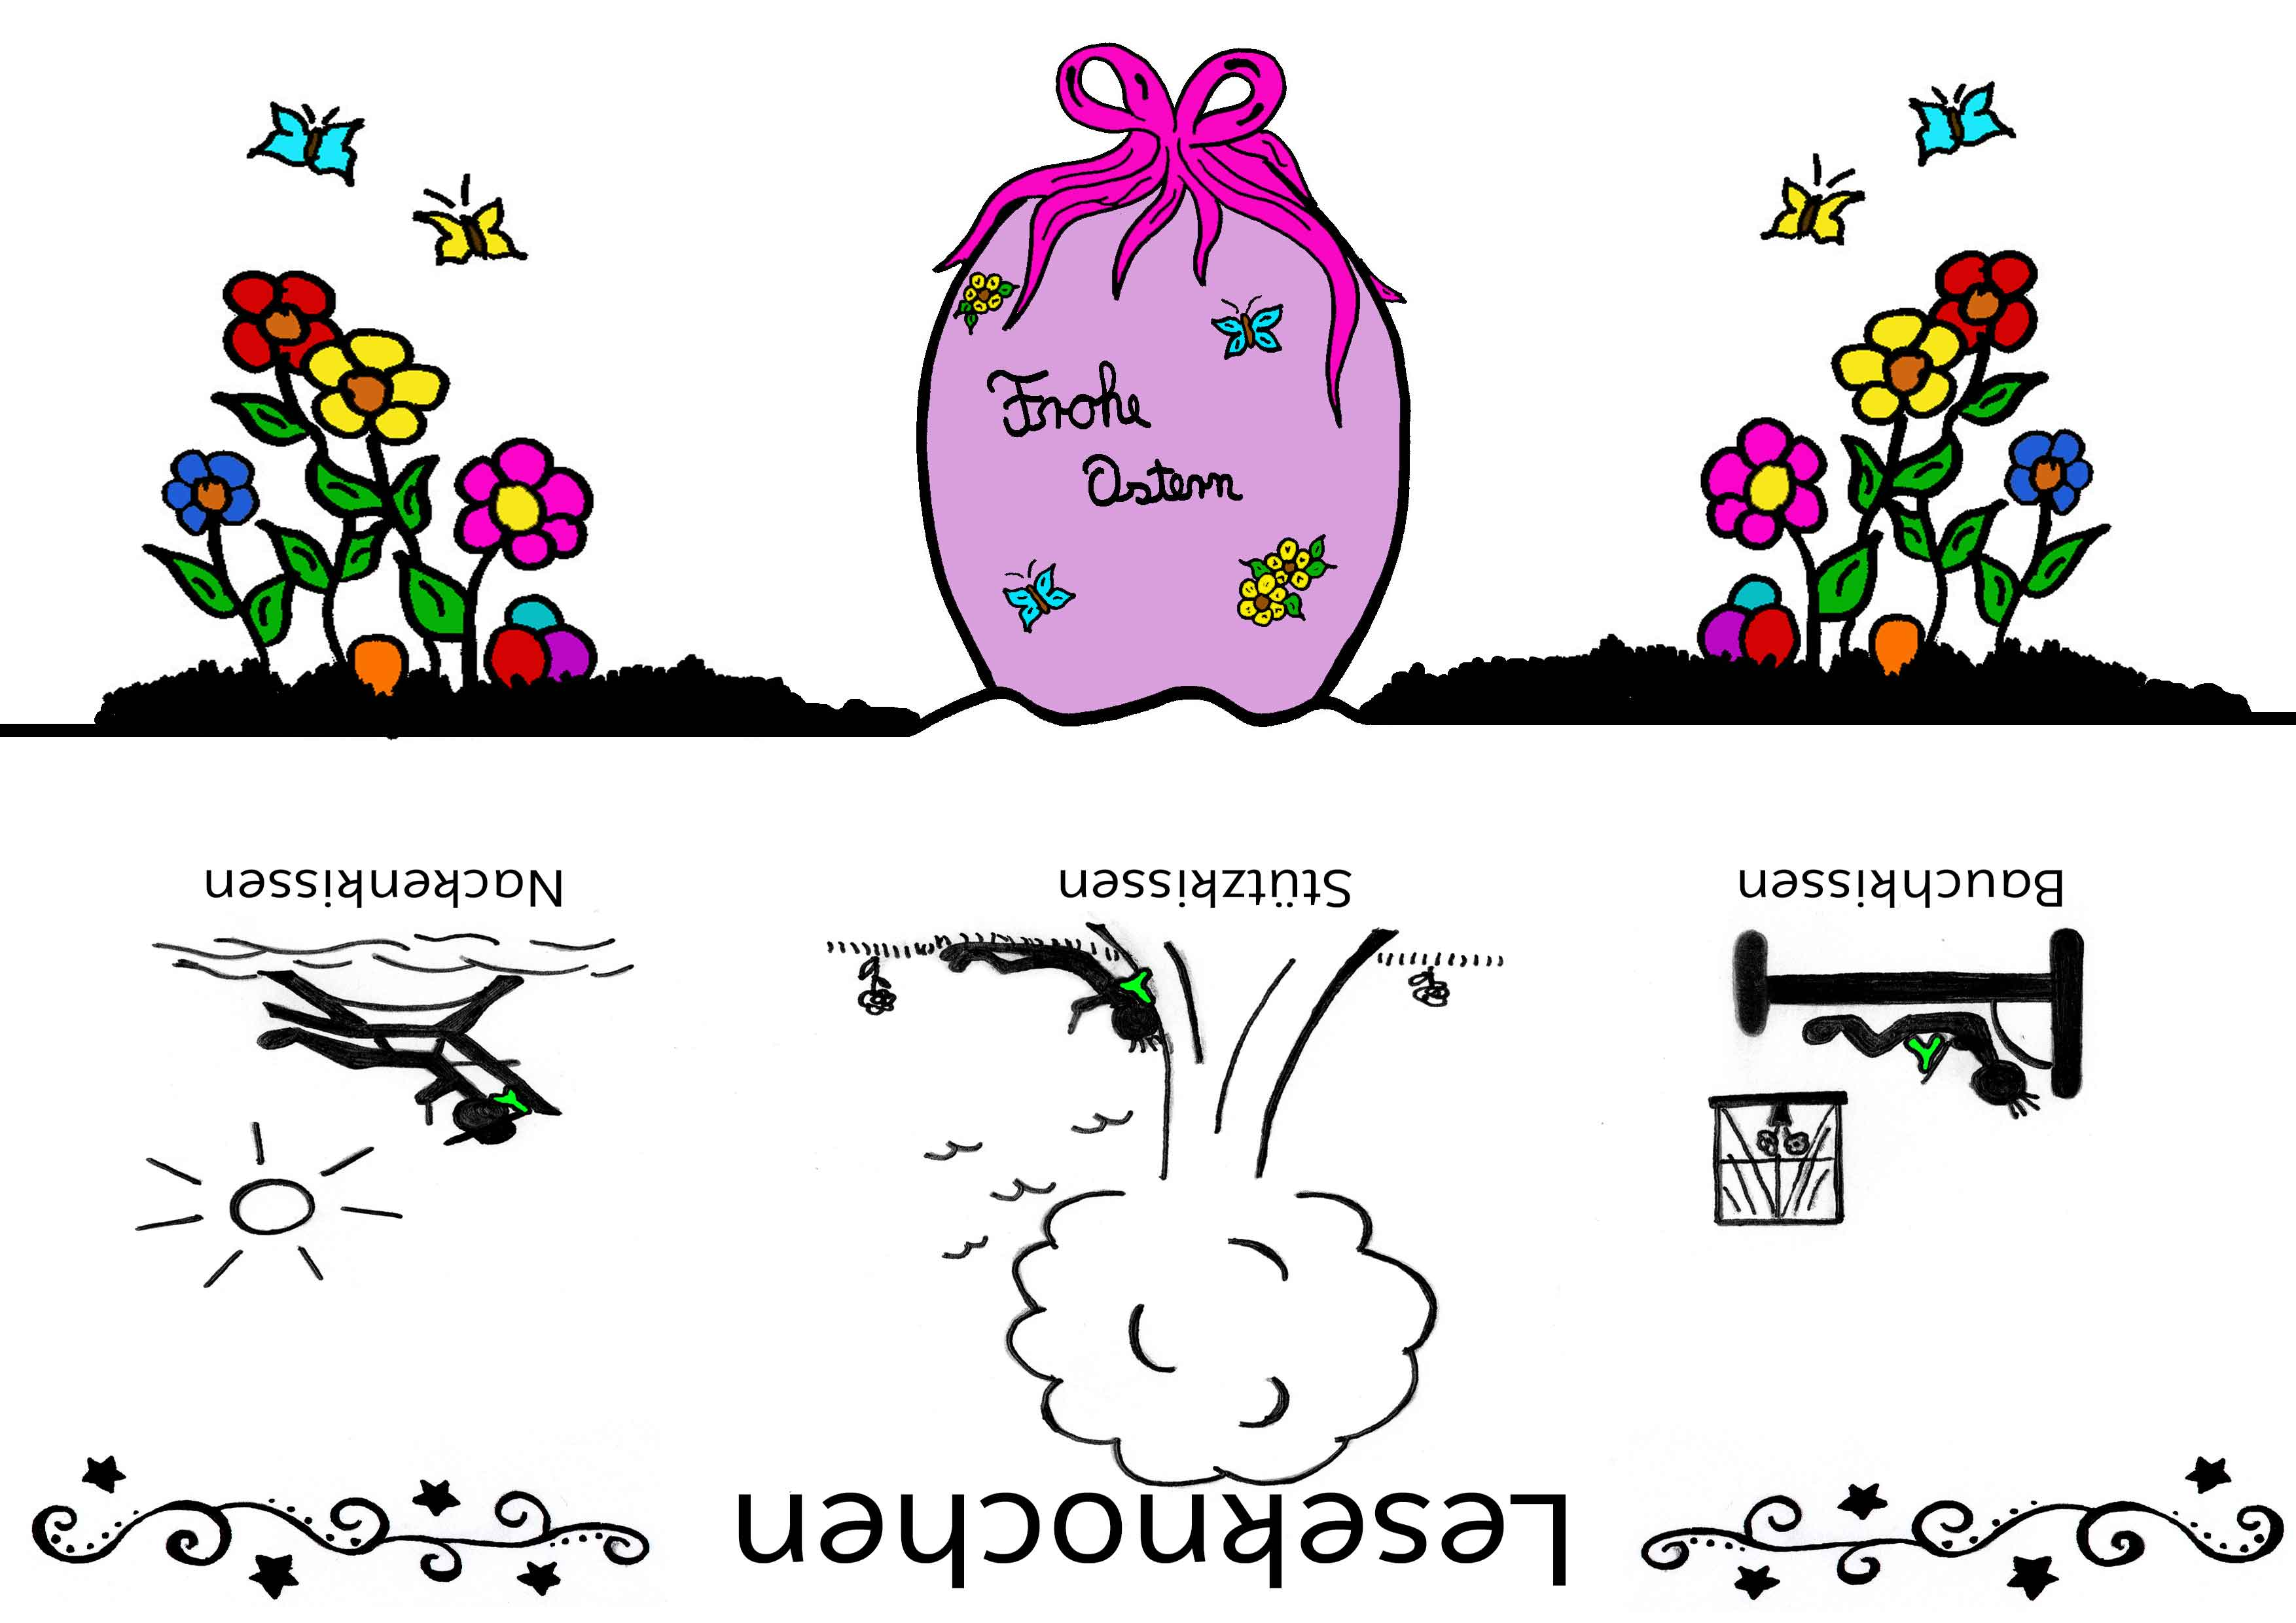 Leseknochen Banderole Frohe Ostern